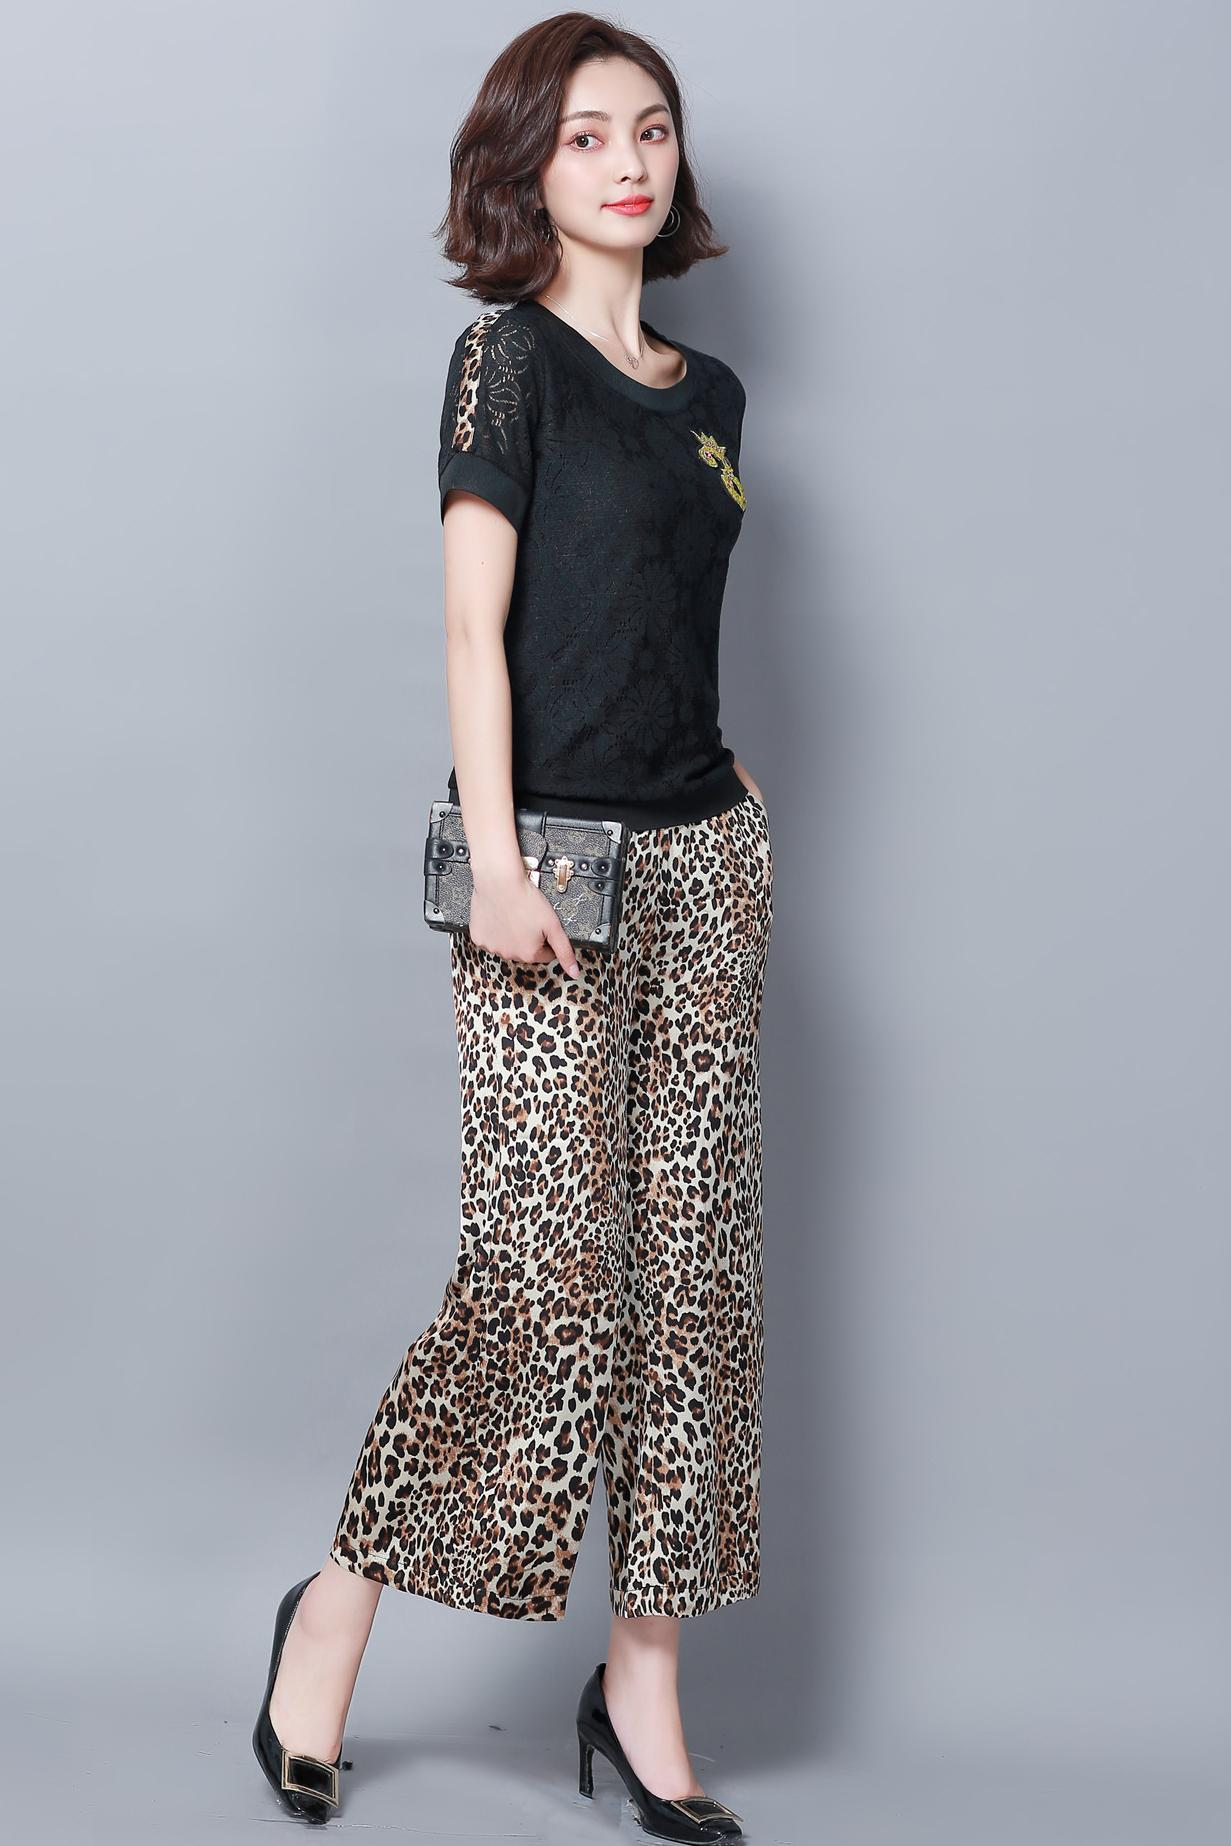 Summer Black Two Piece Sets Women Plus Size Short Sleeve Lace Tops And Leopard Print Wide Leg Pants Suits Casual Office M-5xl 30